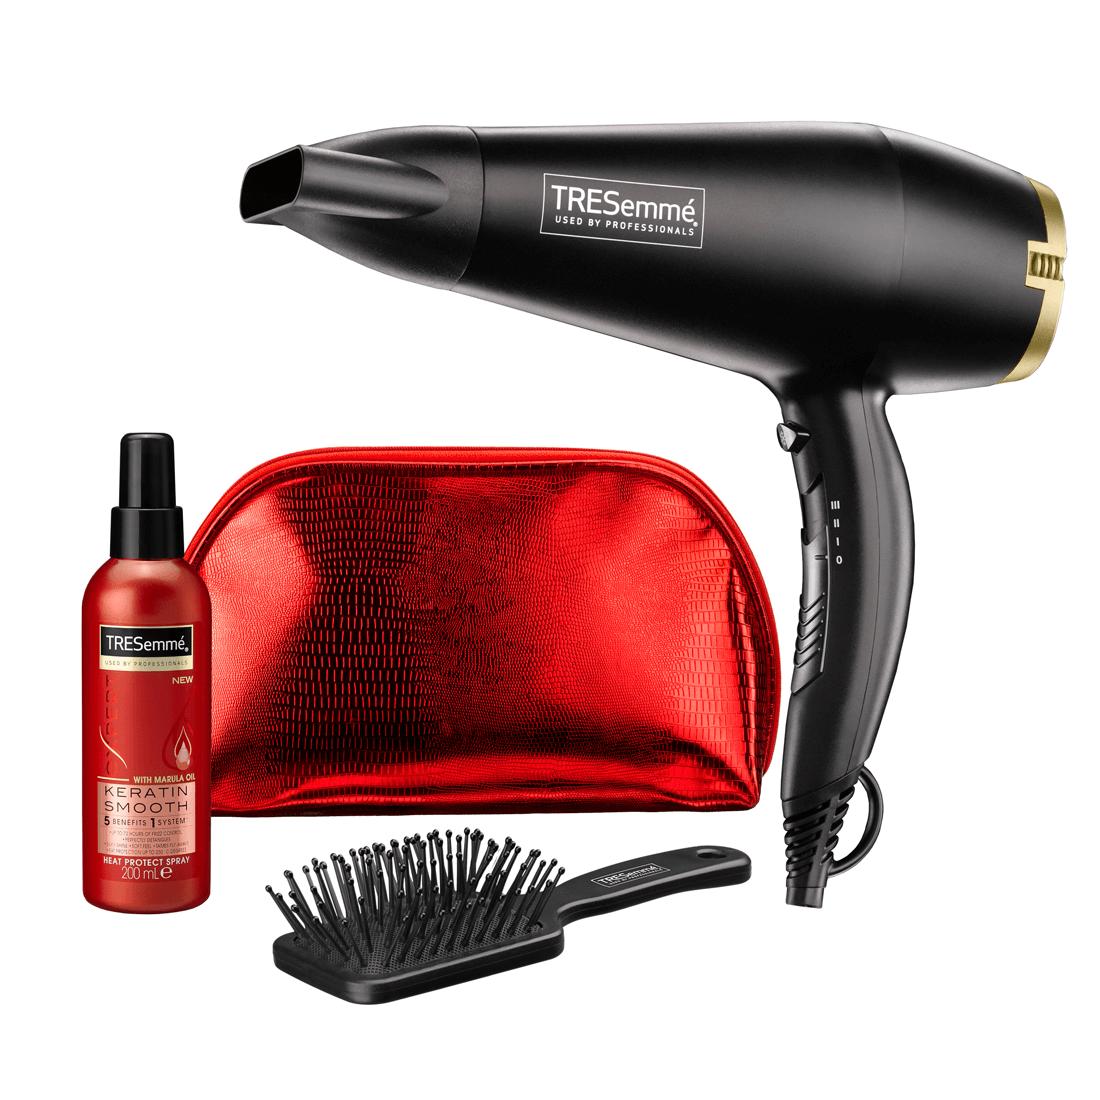 Tresemme Luxurious Hair Dryer Set | Keratin Smooth Heat | Paddle Brush | 2200W | 5543FGU